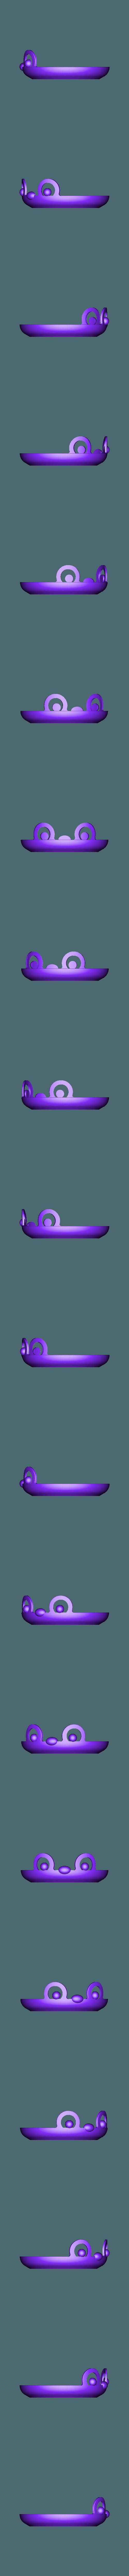 AlexaSkin v1.stl Download free STL file ALEXA - Echo Dot 3 - Skin v1 • 3D printable object, extreme3dprint